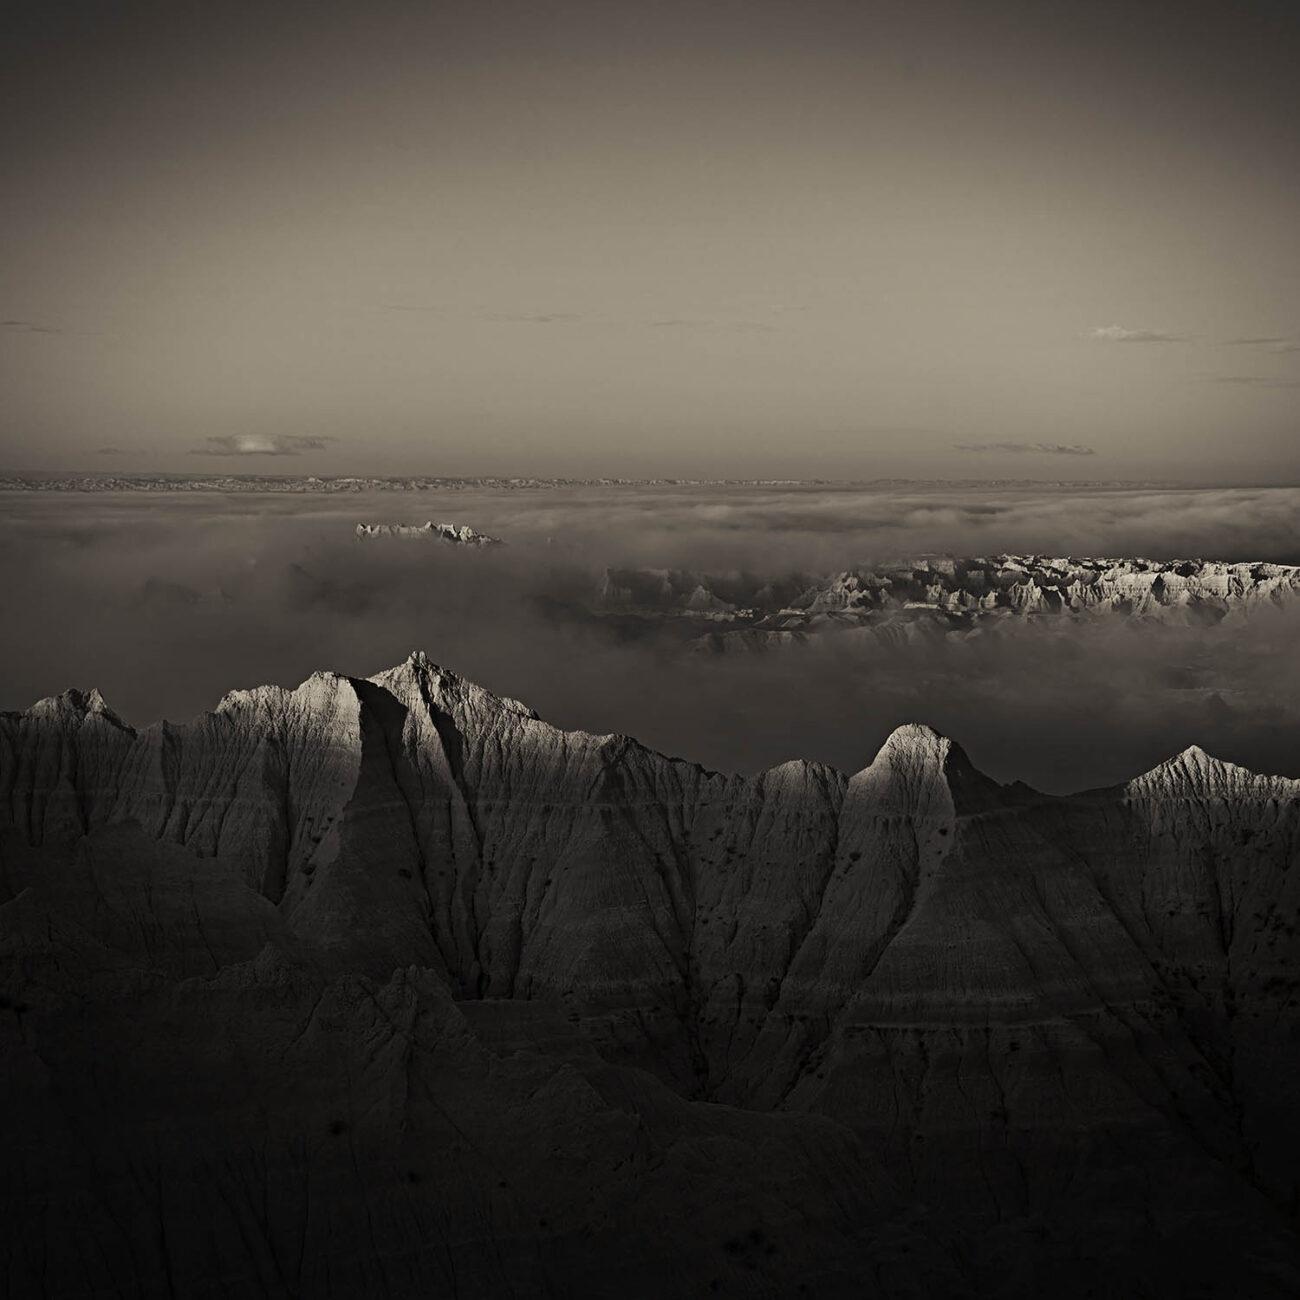 Morning fog in the Badlands, SD, 2010